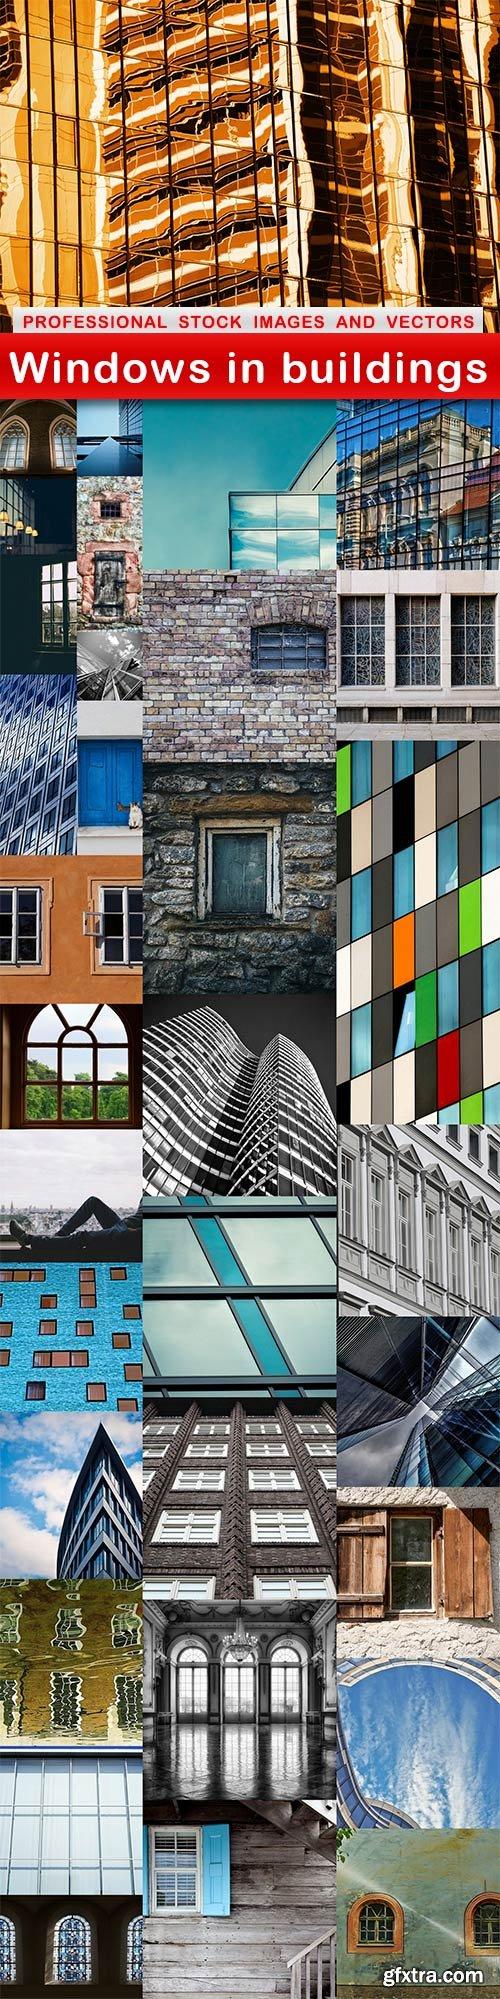 Windows in buildings - 33 UHQ JPEG